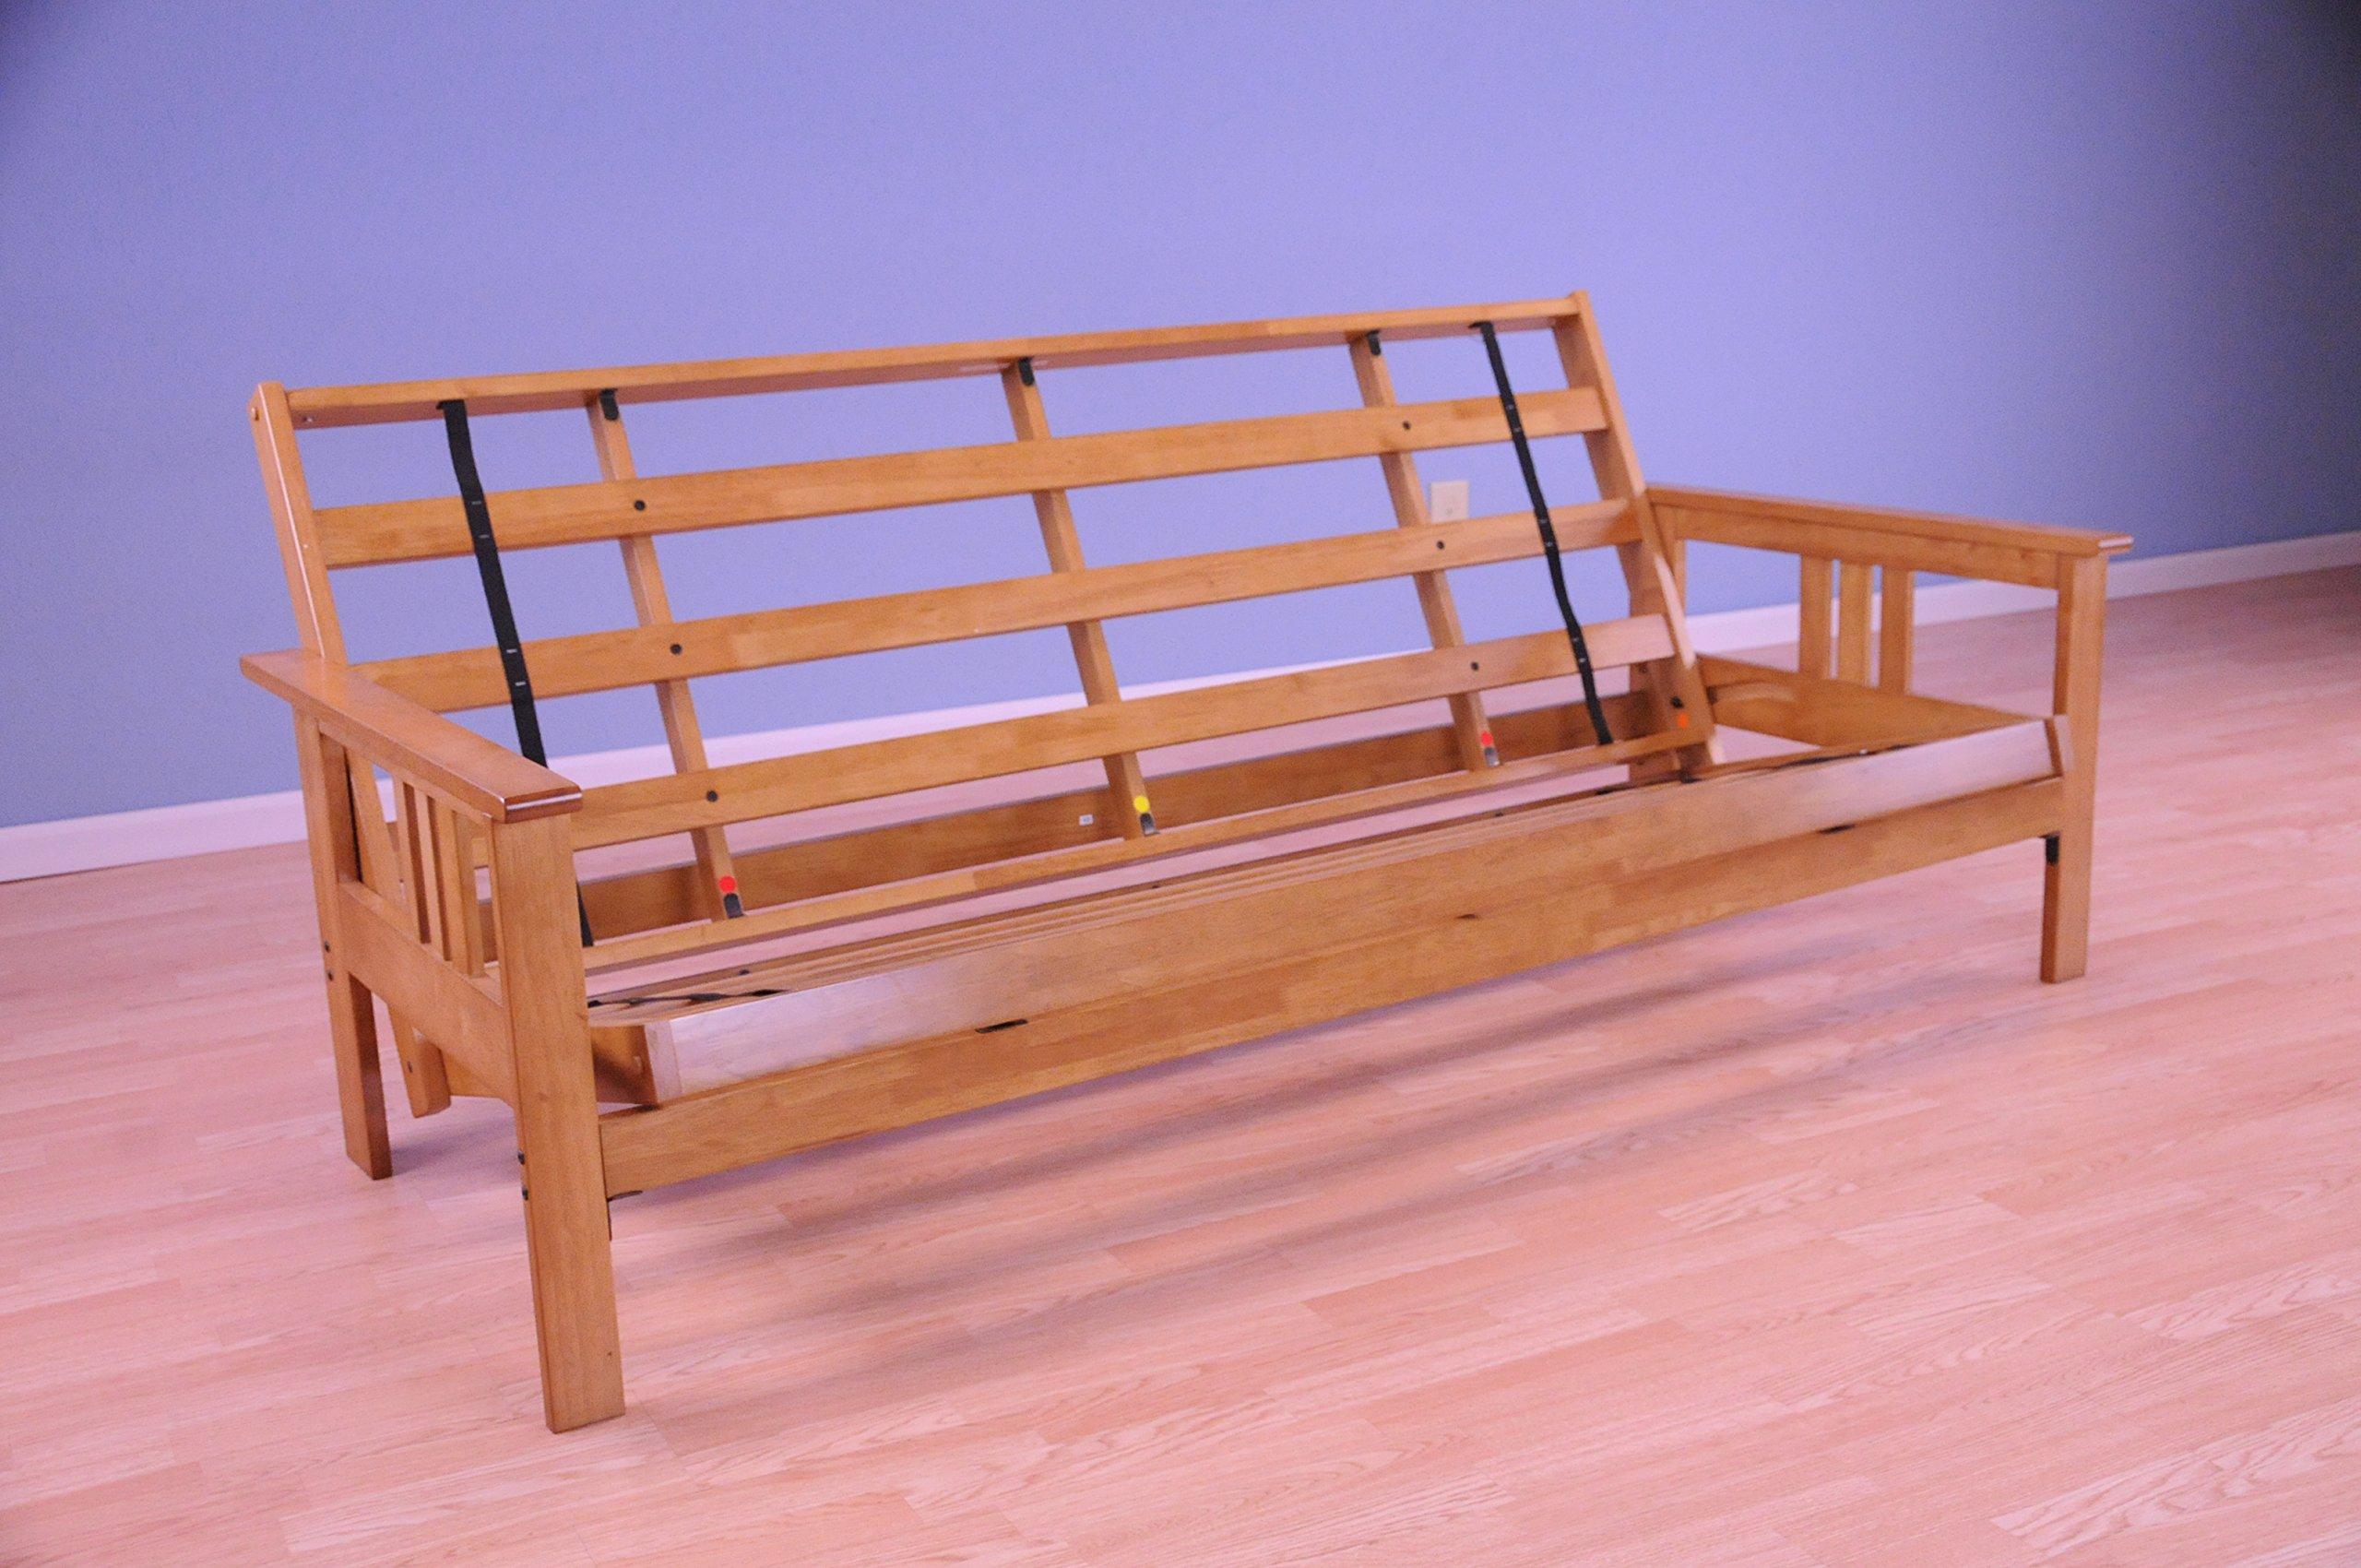 Kodiak Furniture KFMOBTFRAMESET2 Monterey Futon Frame with Butternut Finish, Full, by Kodiak Furniture